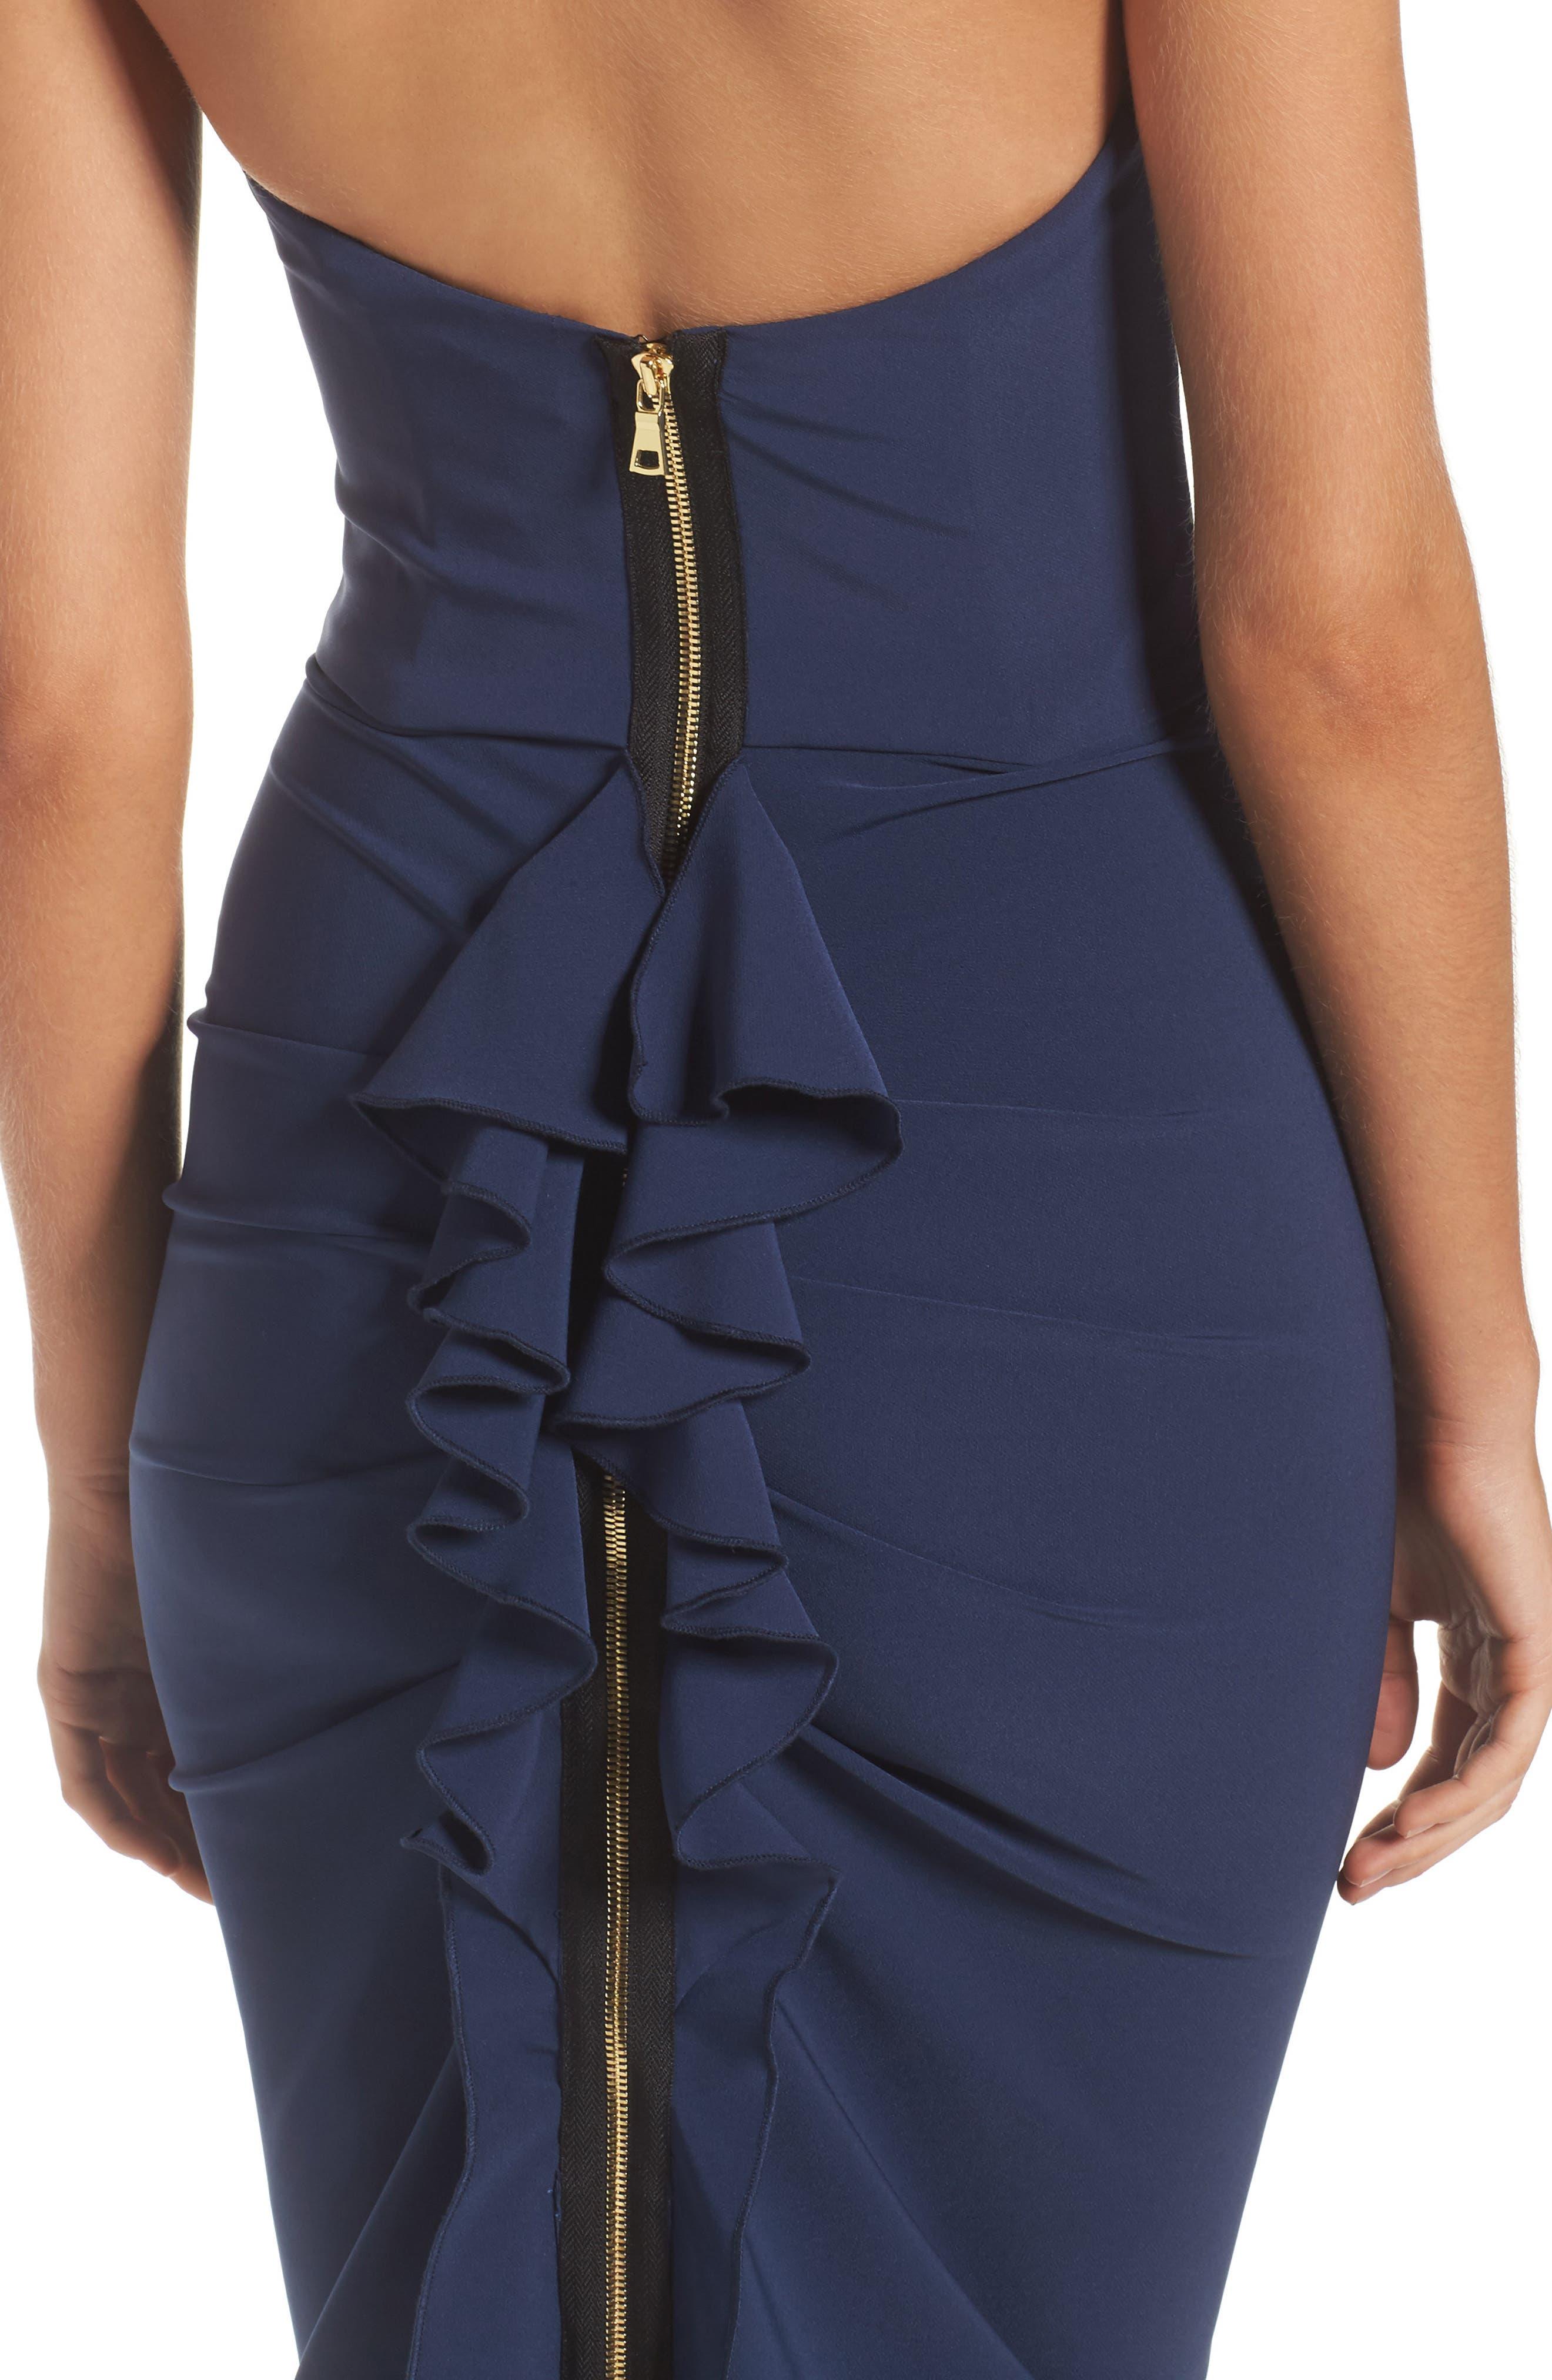 Strapless Ruffle Dress,                             Alternate thumbnail 4, color,                             Navy